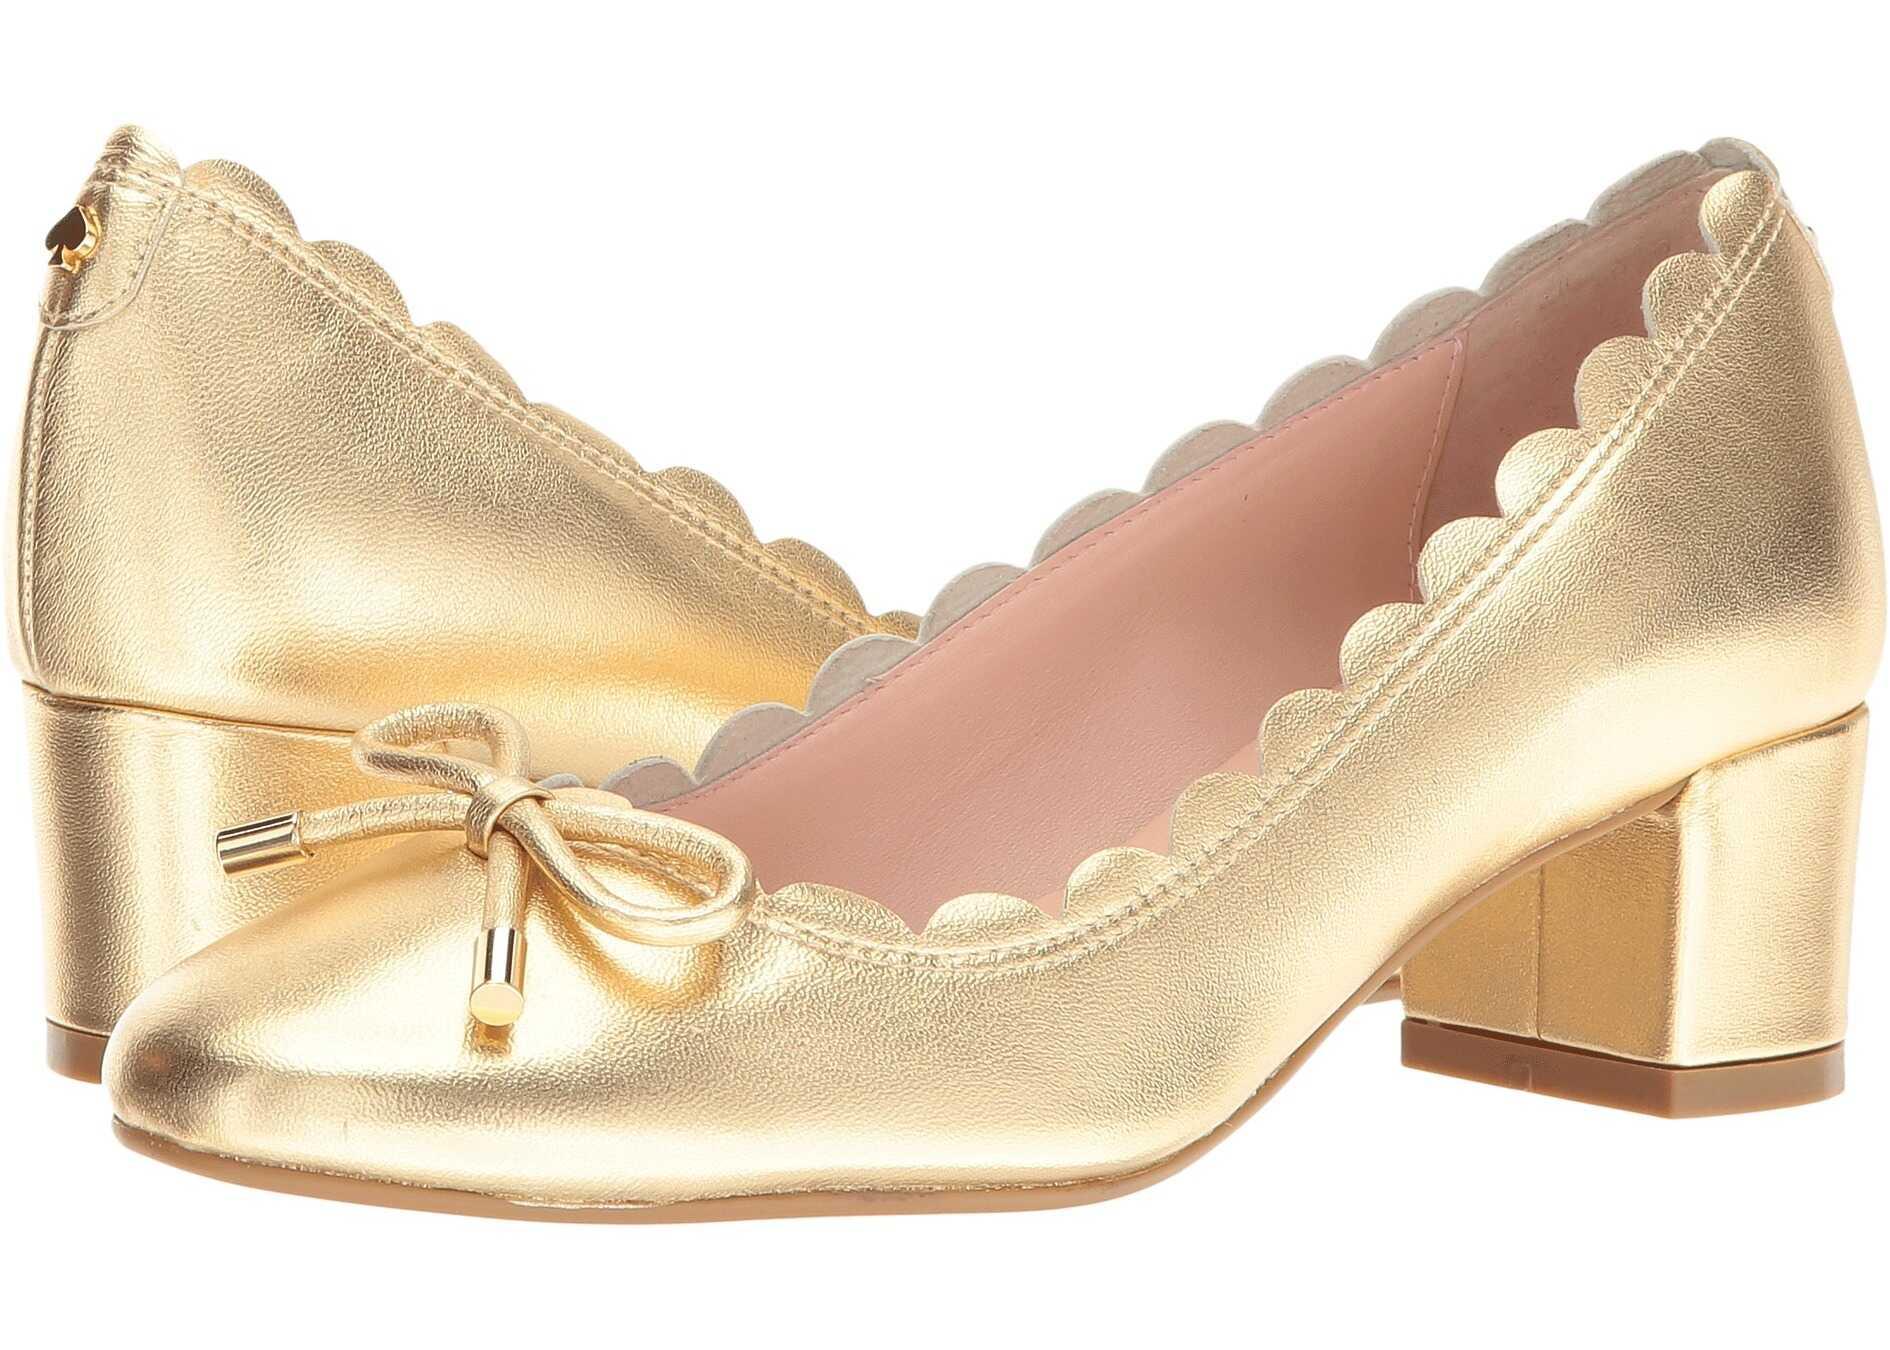 Kate Spade New York Yasmin Gold Metallic Nappa